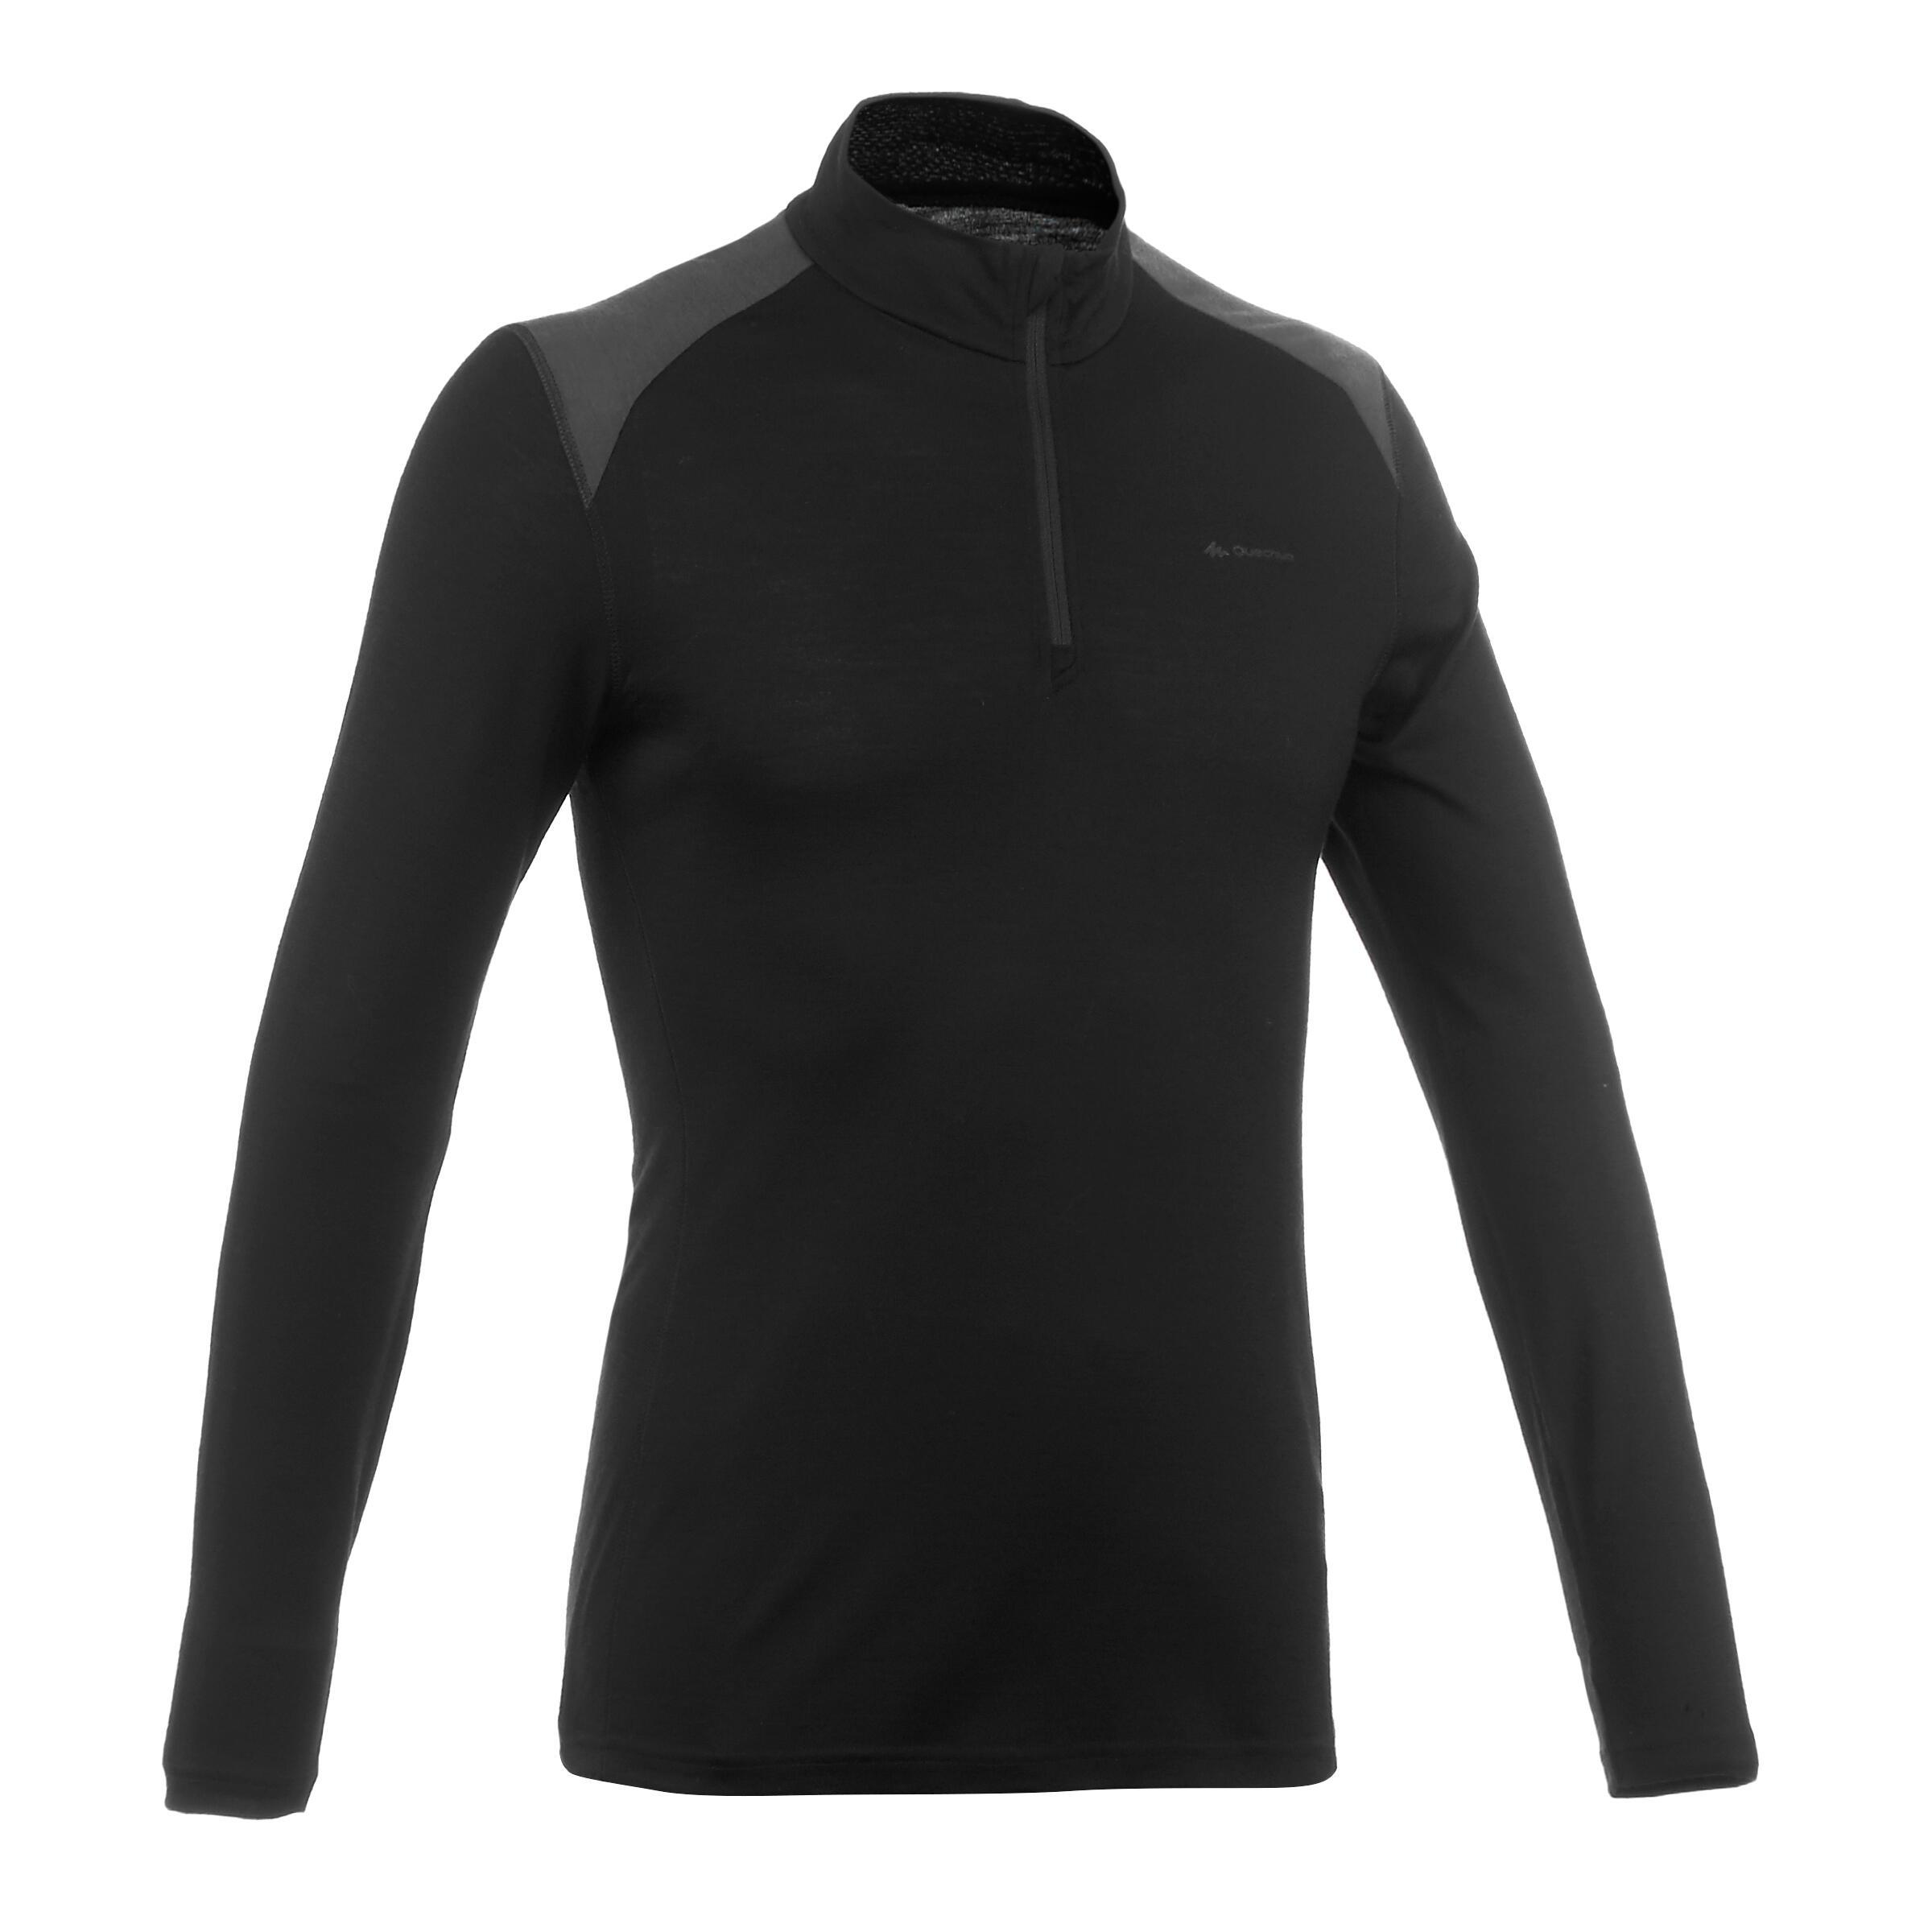 Men's Techwool 190 black zipped long-sleeved trekking T-shirt